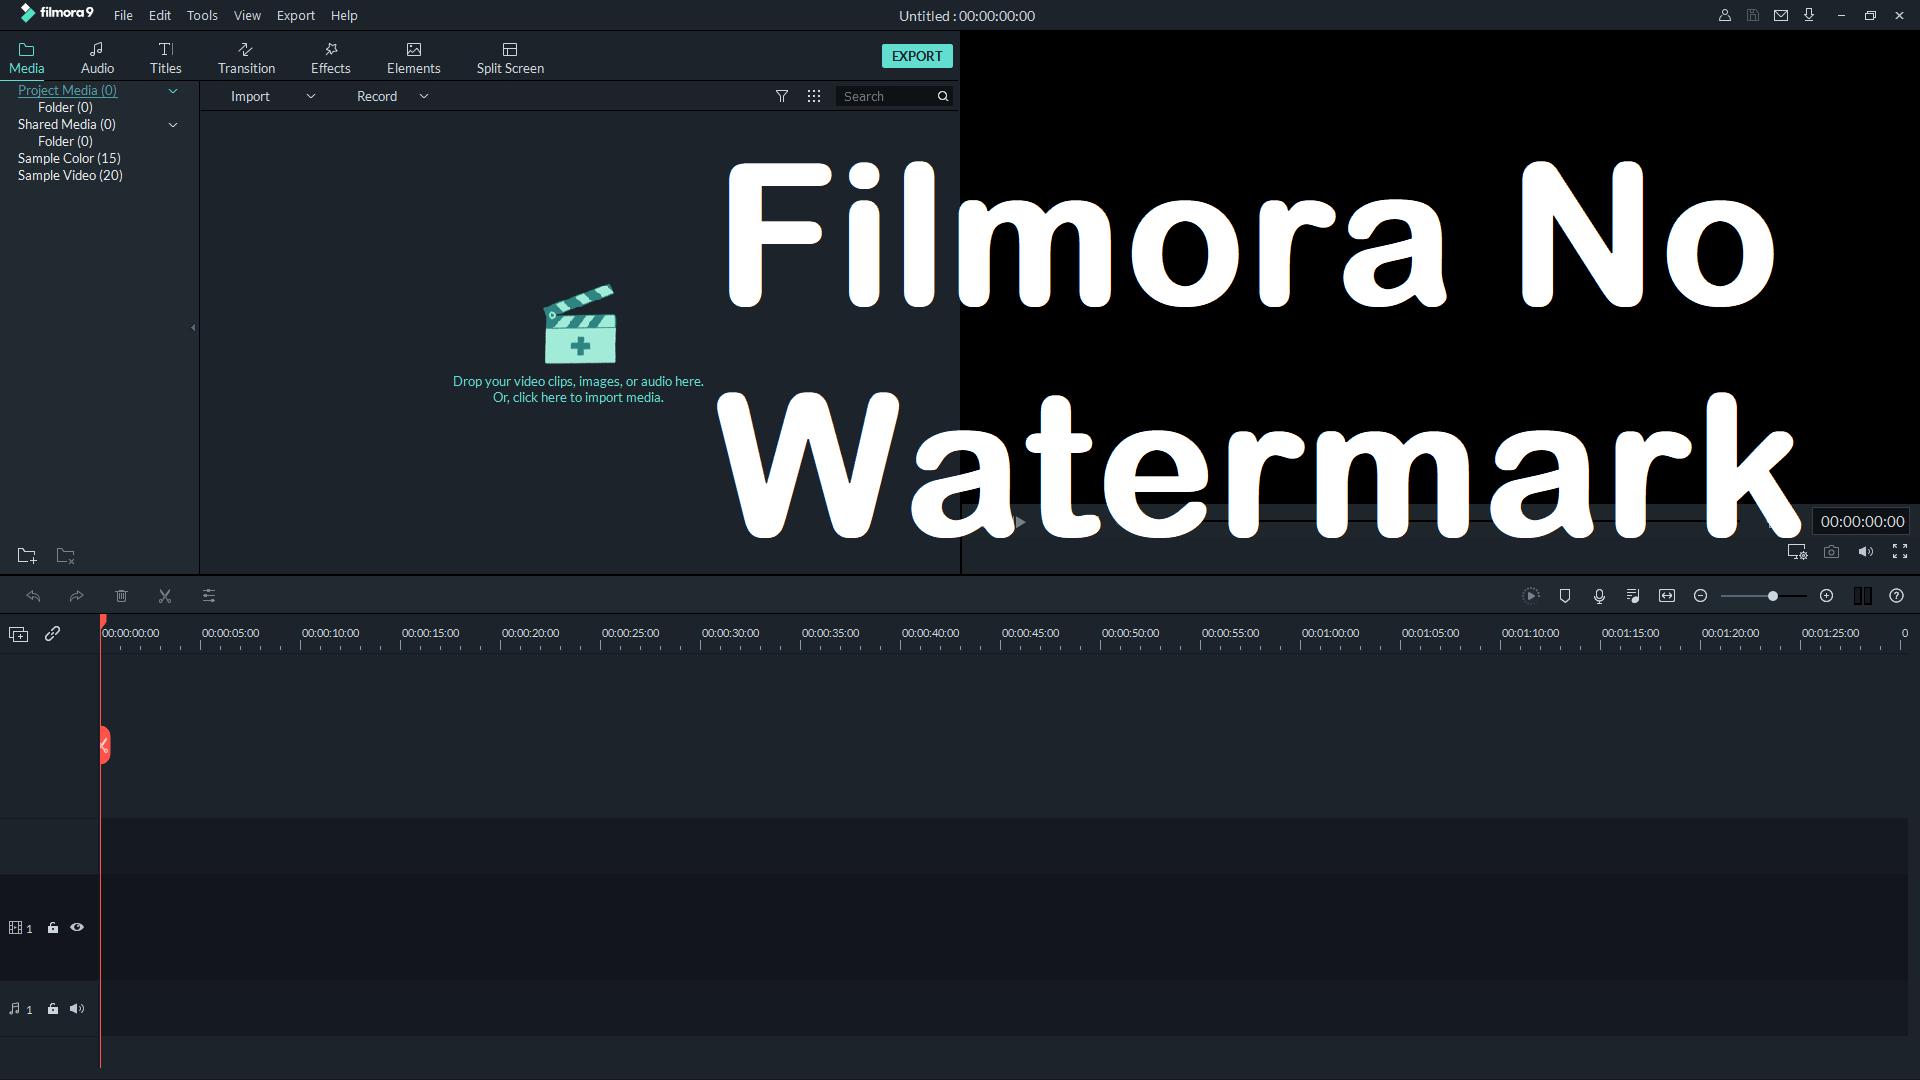 Download-Aplikasi-Filmorago-Pro-For-PC-Windows-NO-Watermark